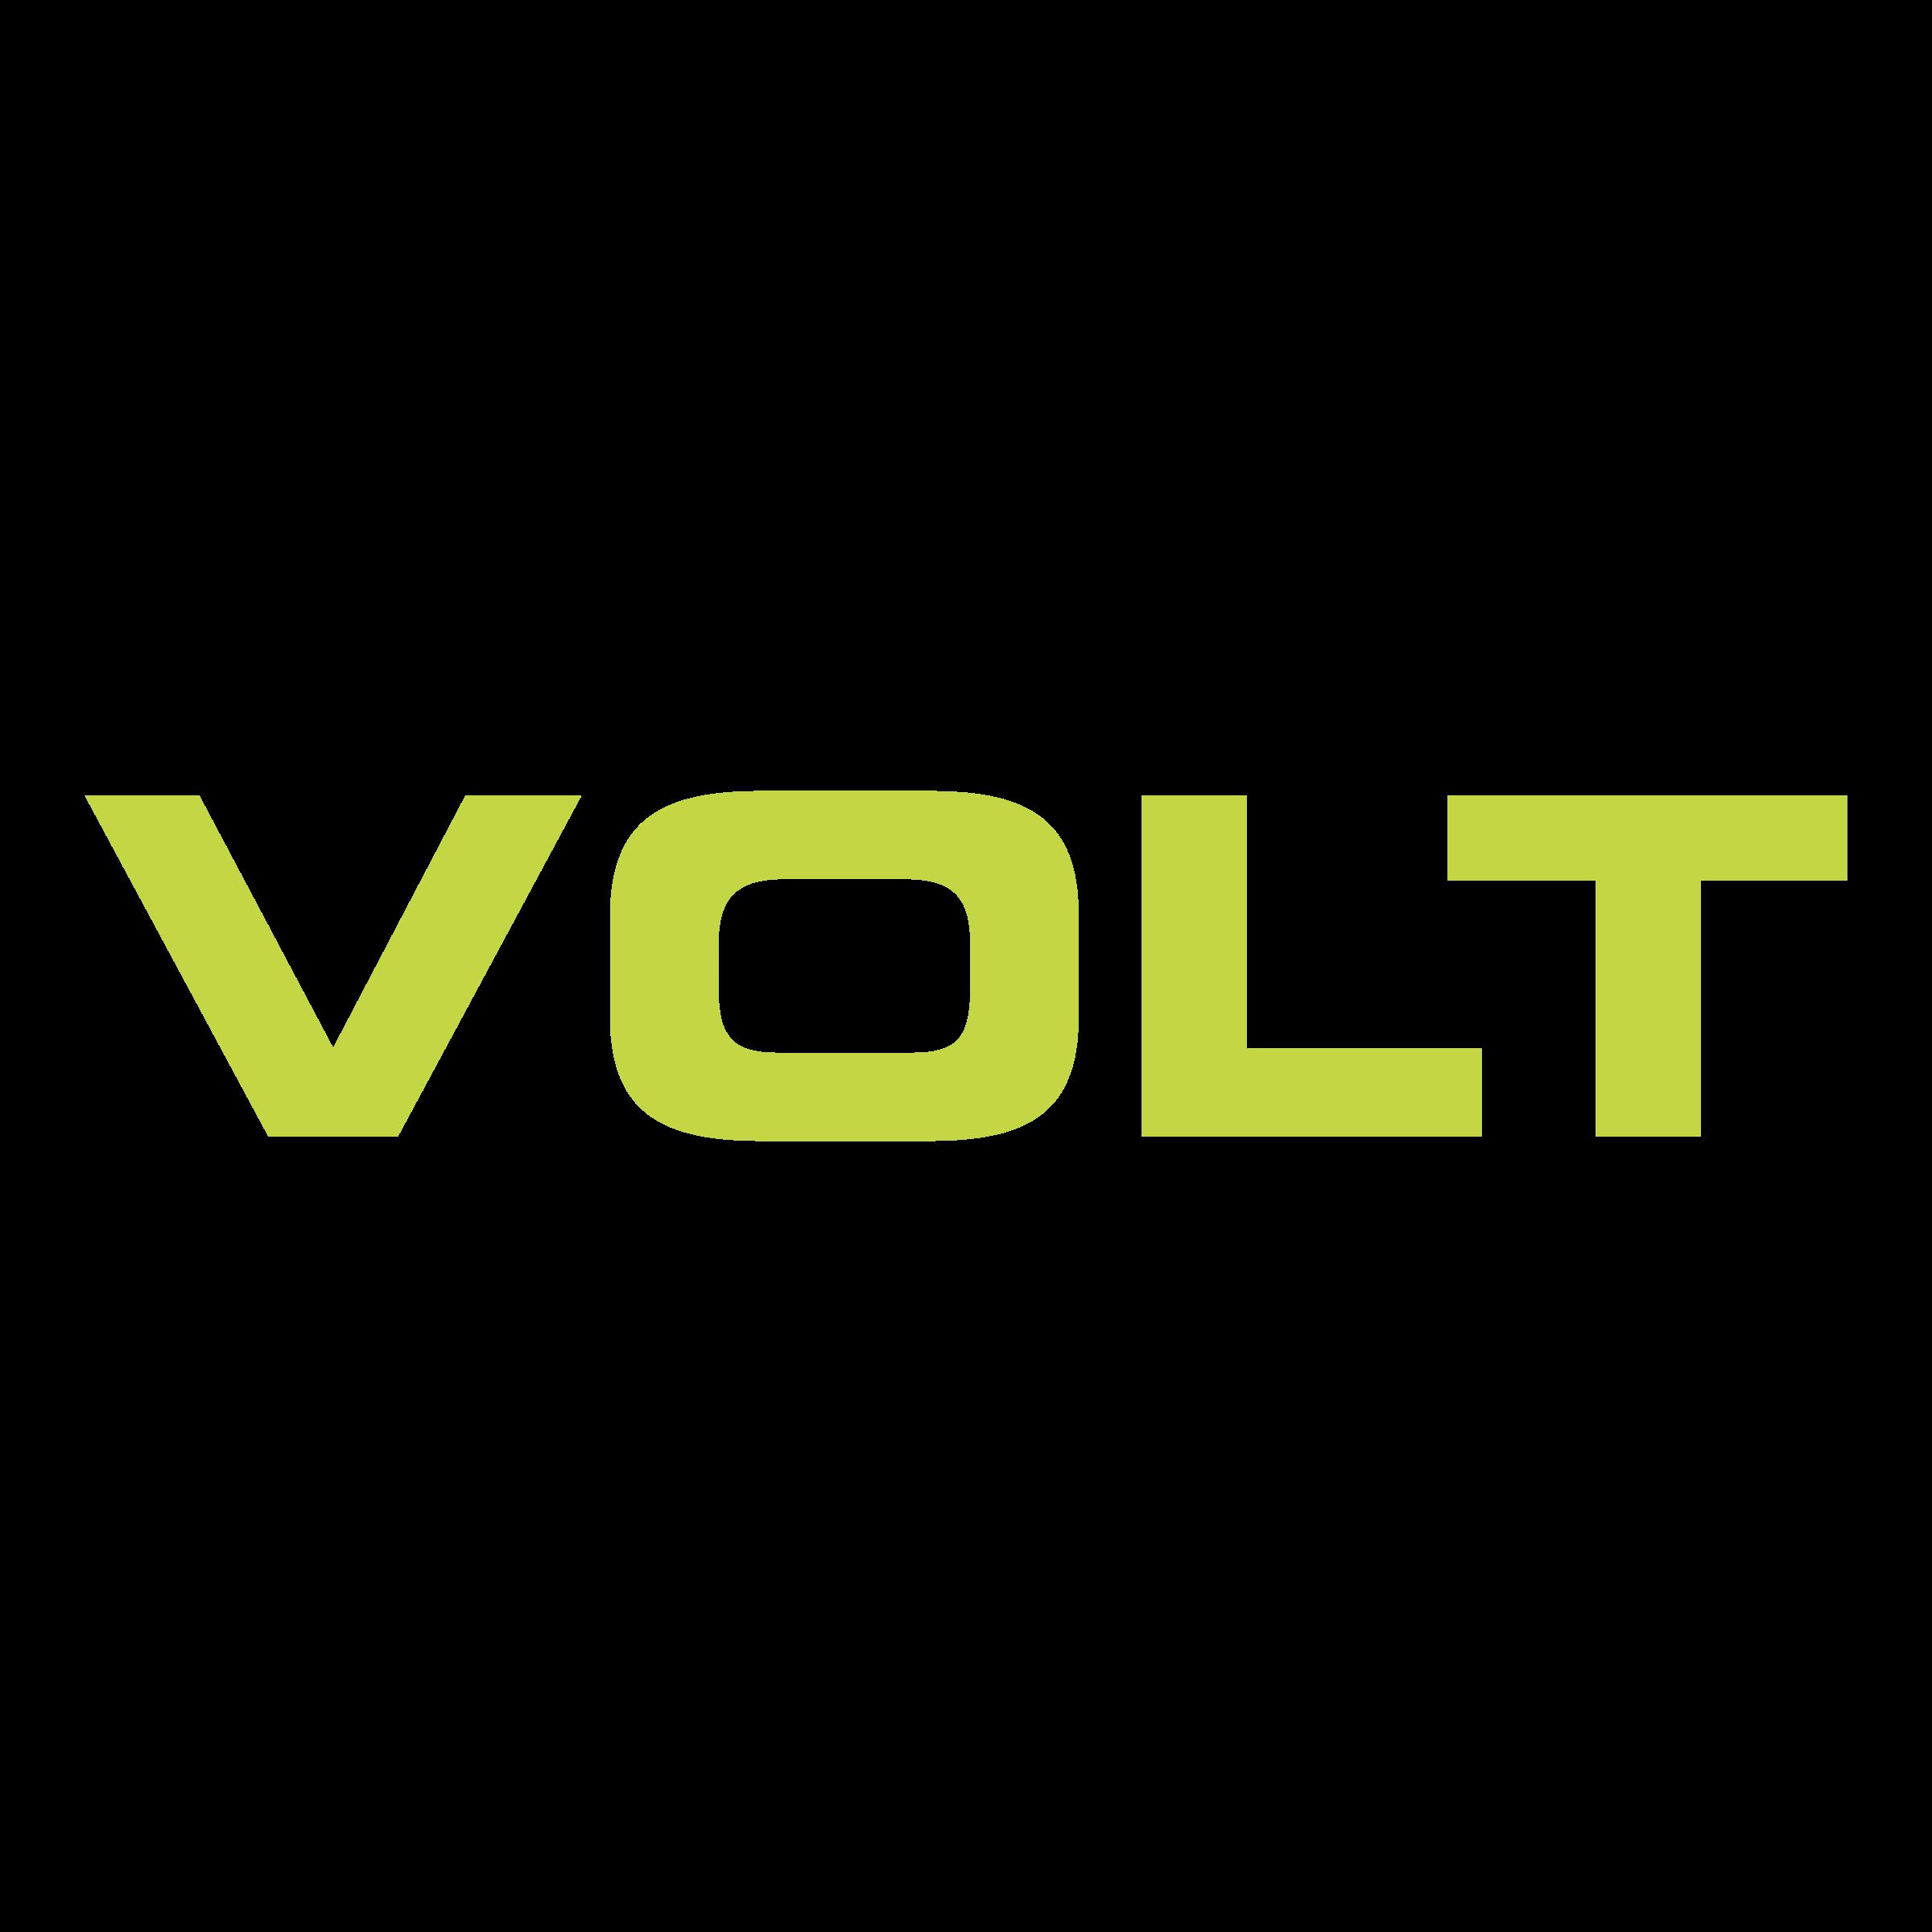 Volt Png >> Volt Logo Png Transparent Svg Vector Freebie Supply